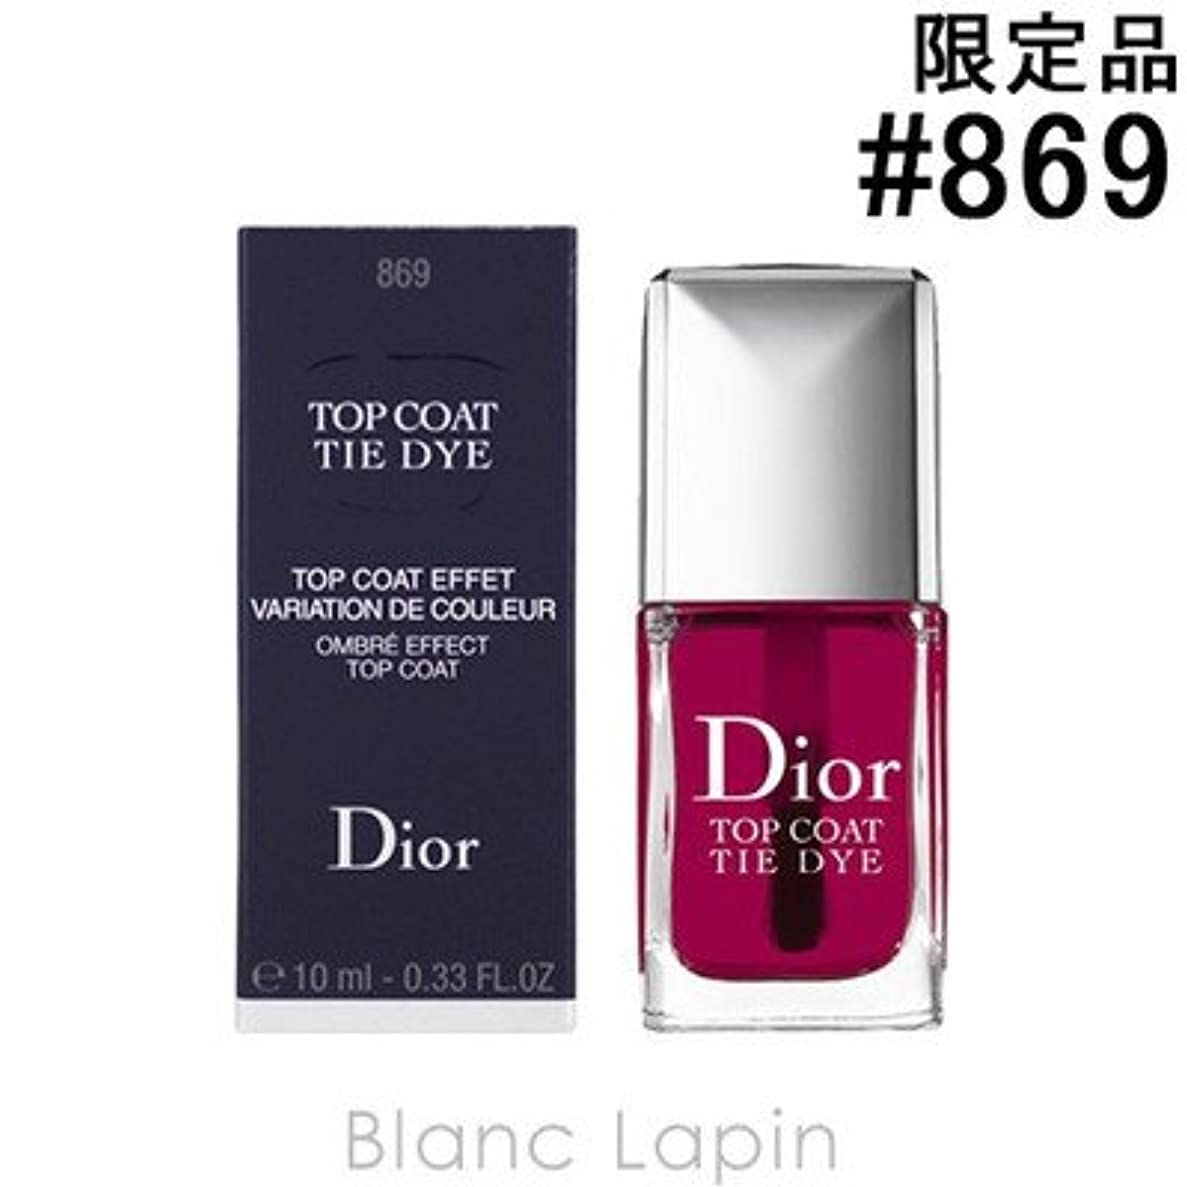 Dior トップコートタイダイ #869 / 10ml [260138] [並行輸入品]